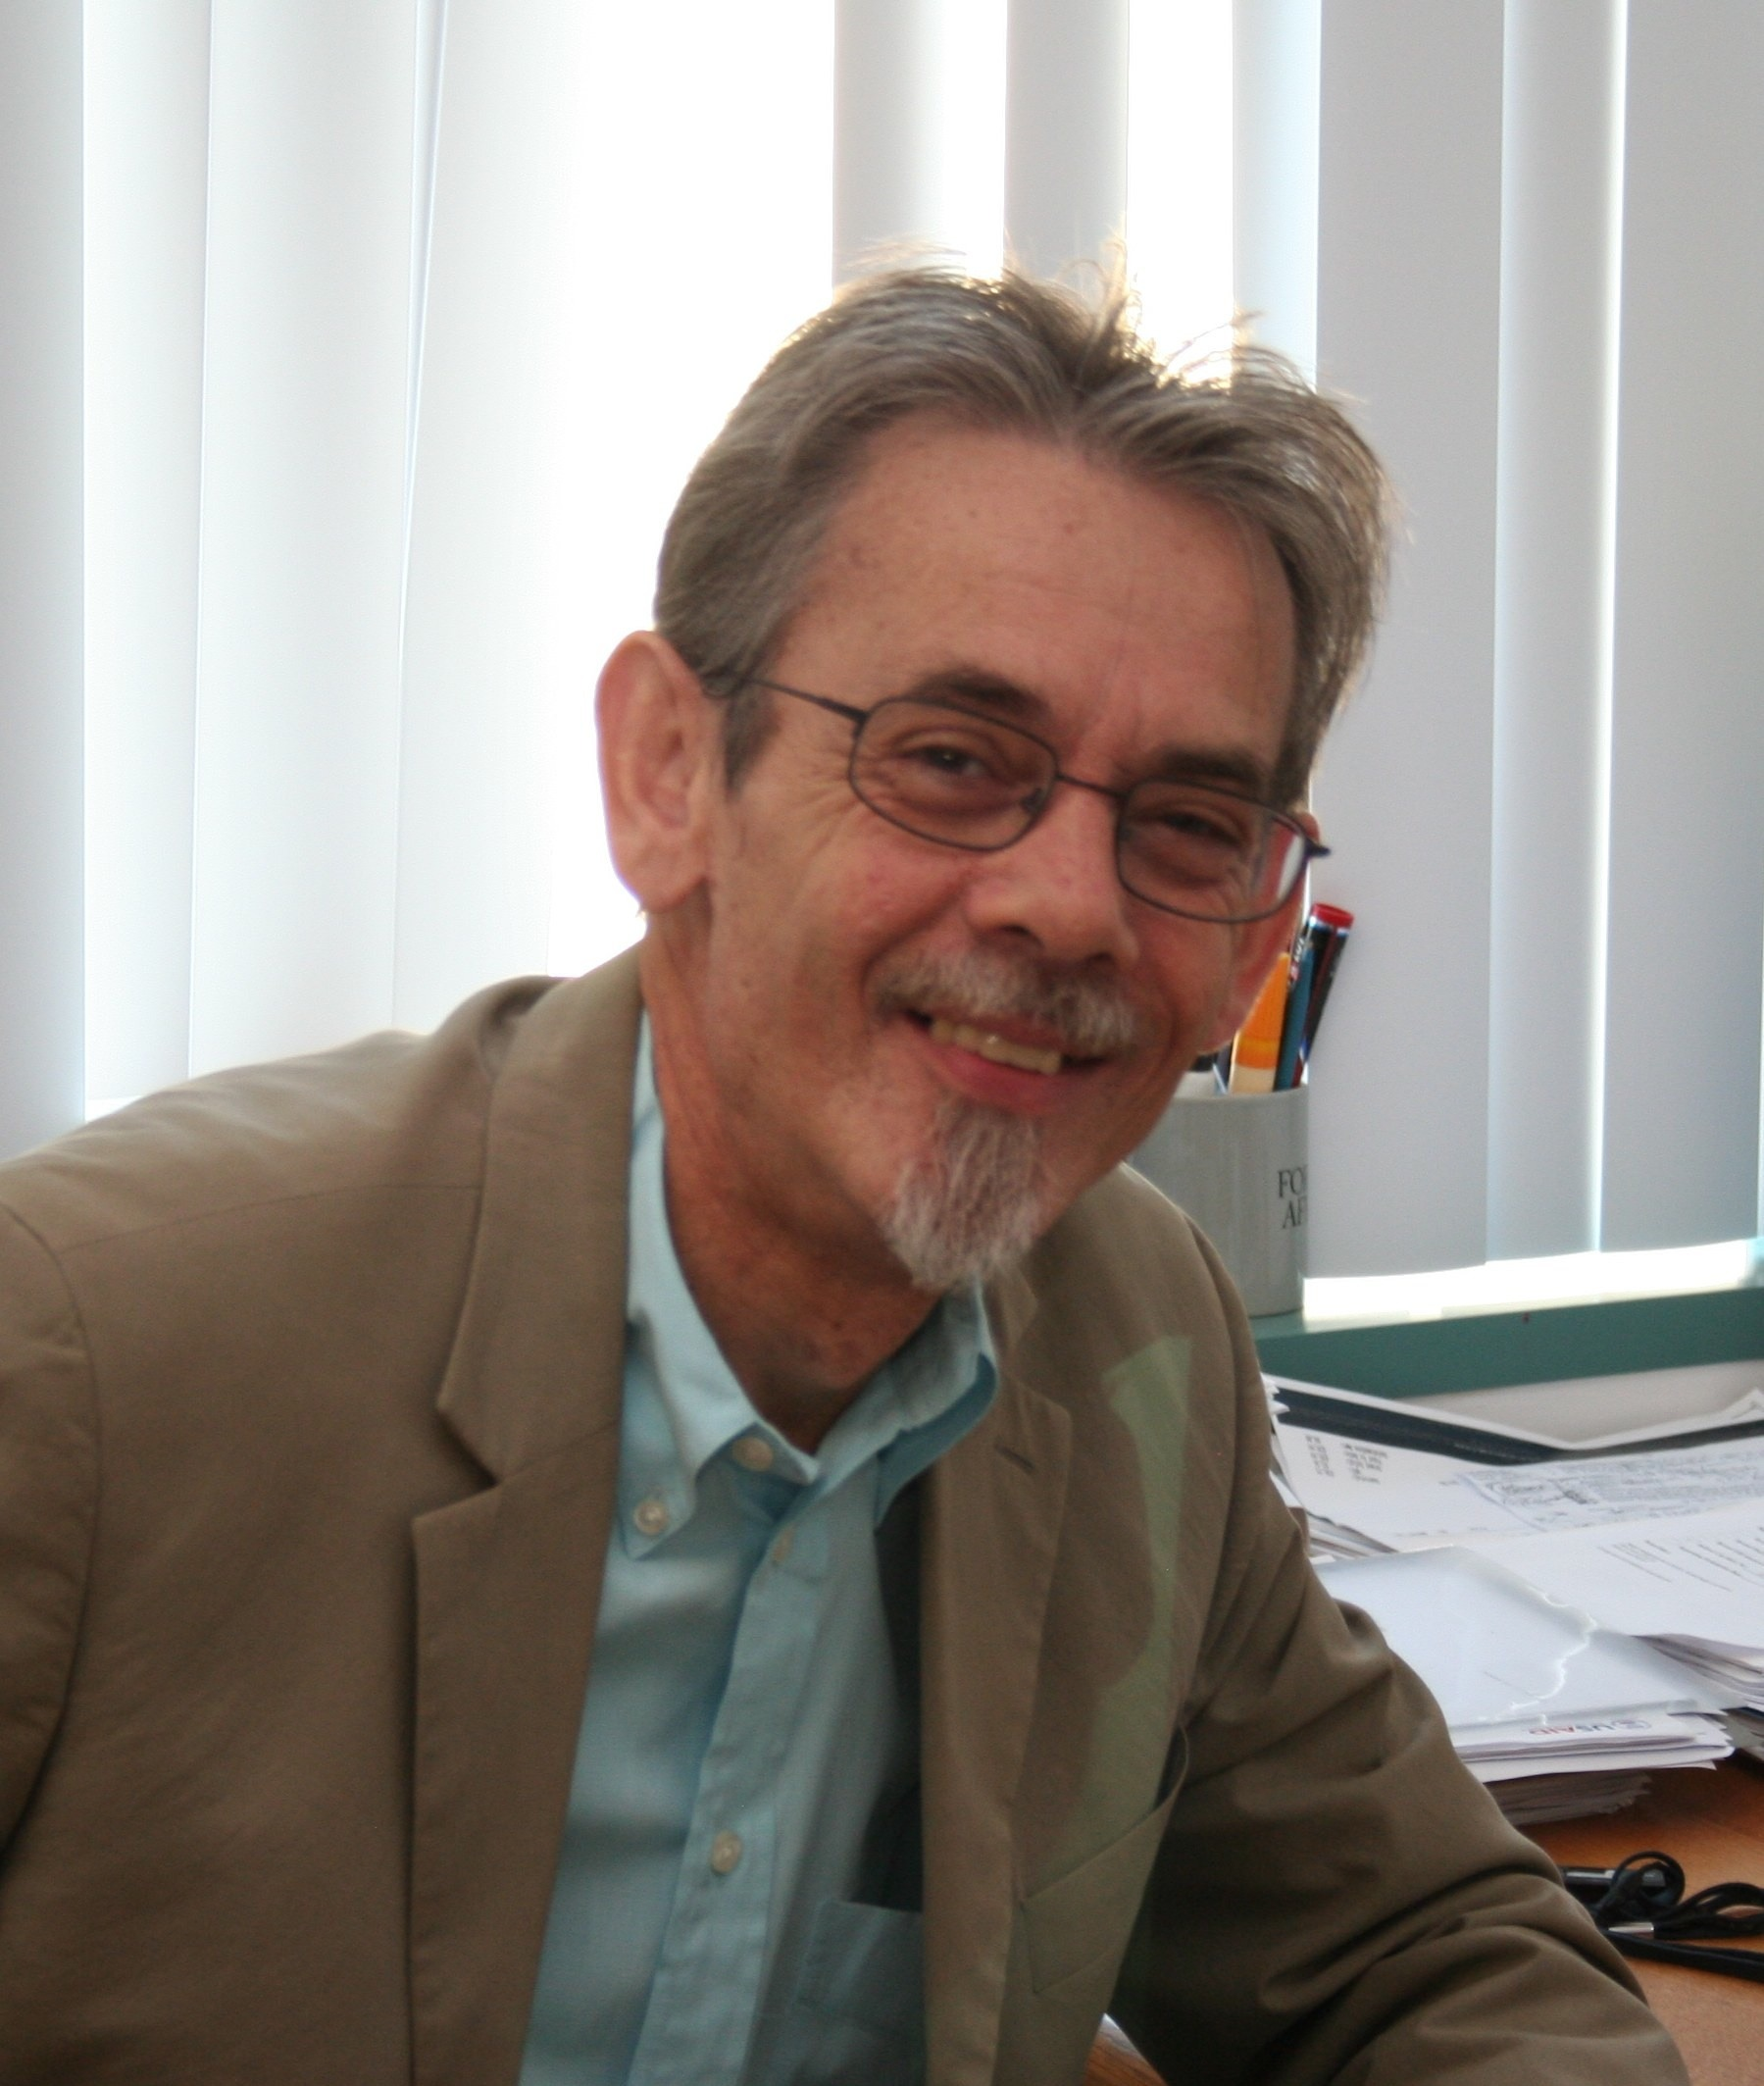 Stephen Tomlin